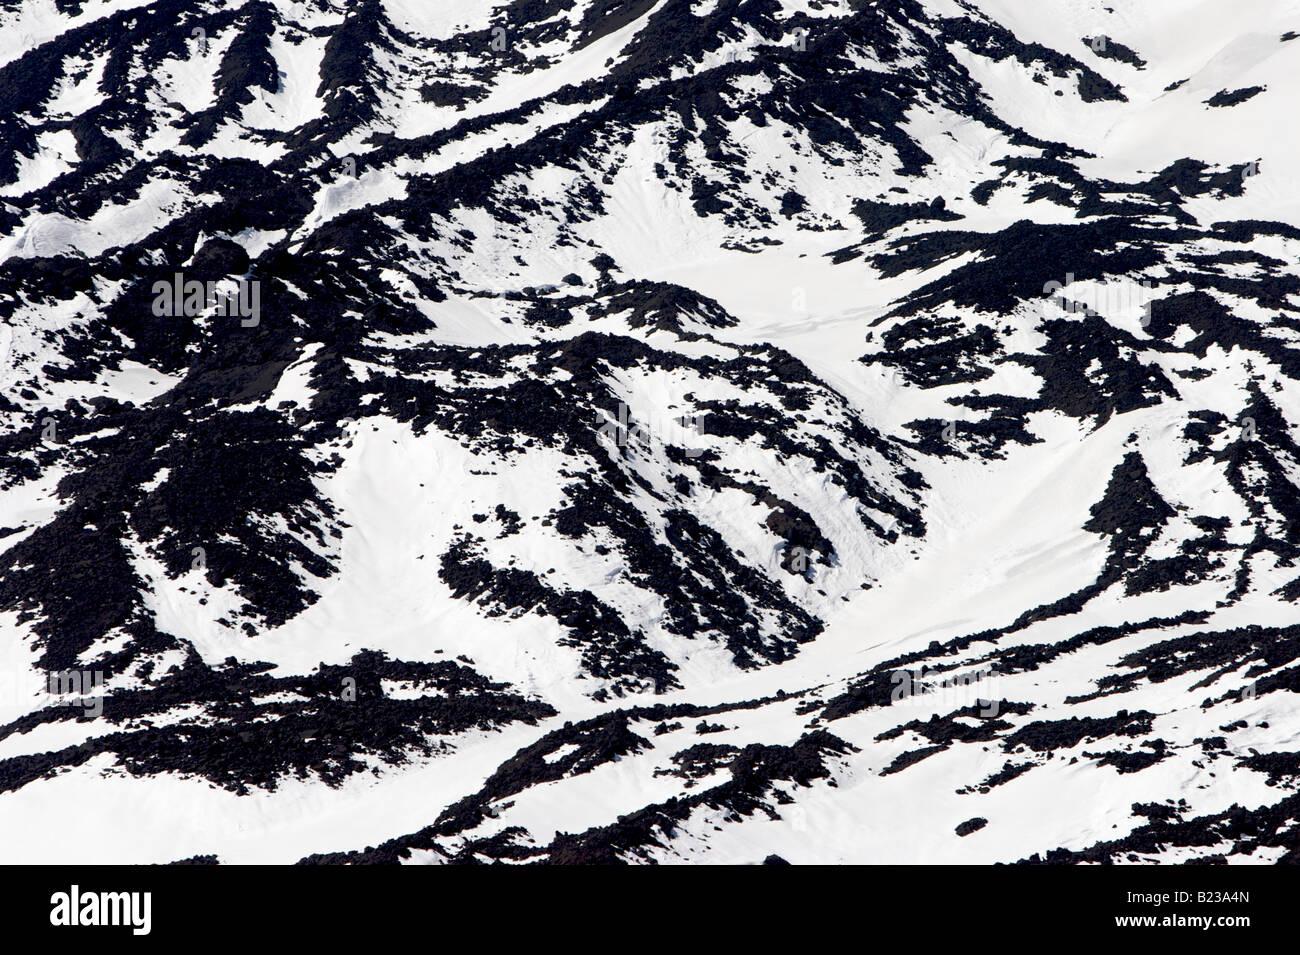 Snowcapped Imágenes De Stock Snowcapped Fotos De Stock: Etna Snow Stock Photos & Etna Snow Stock Images